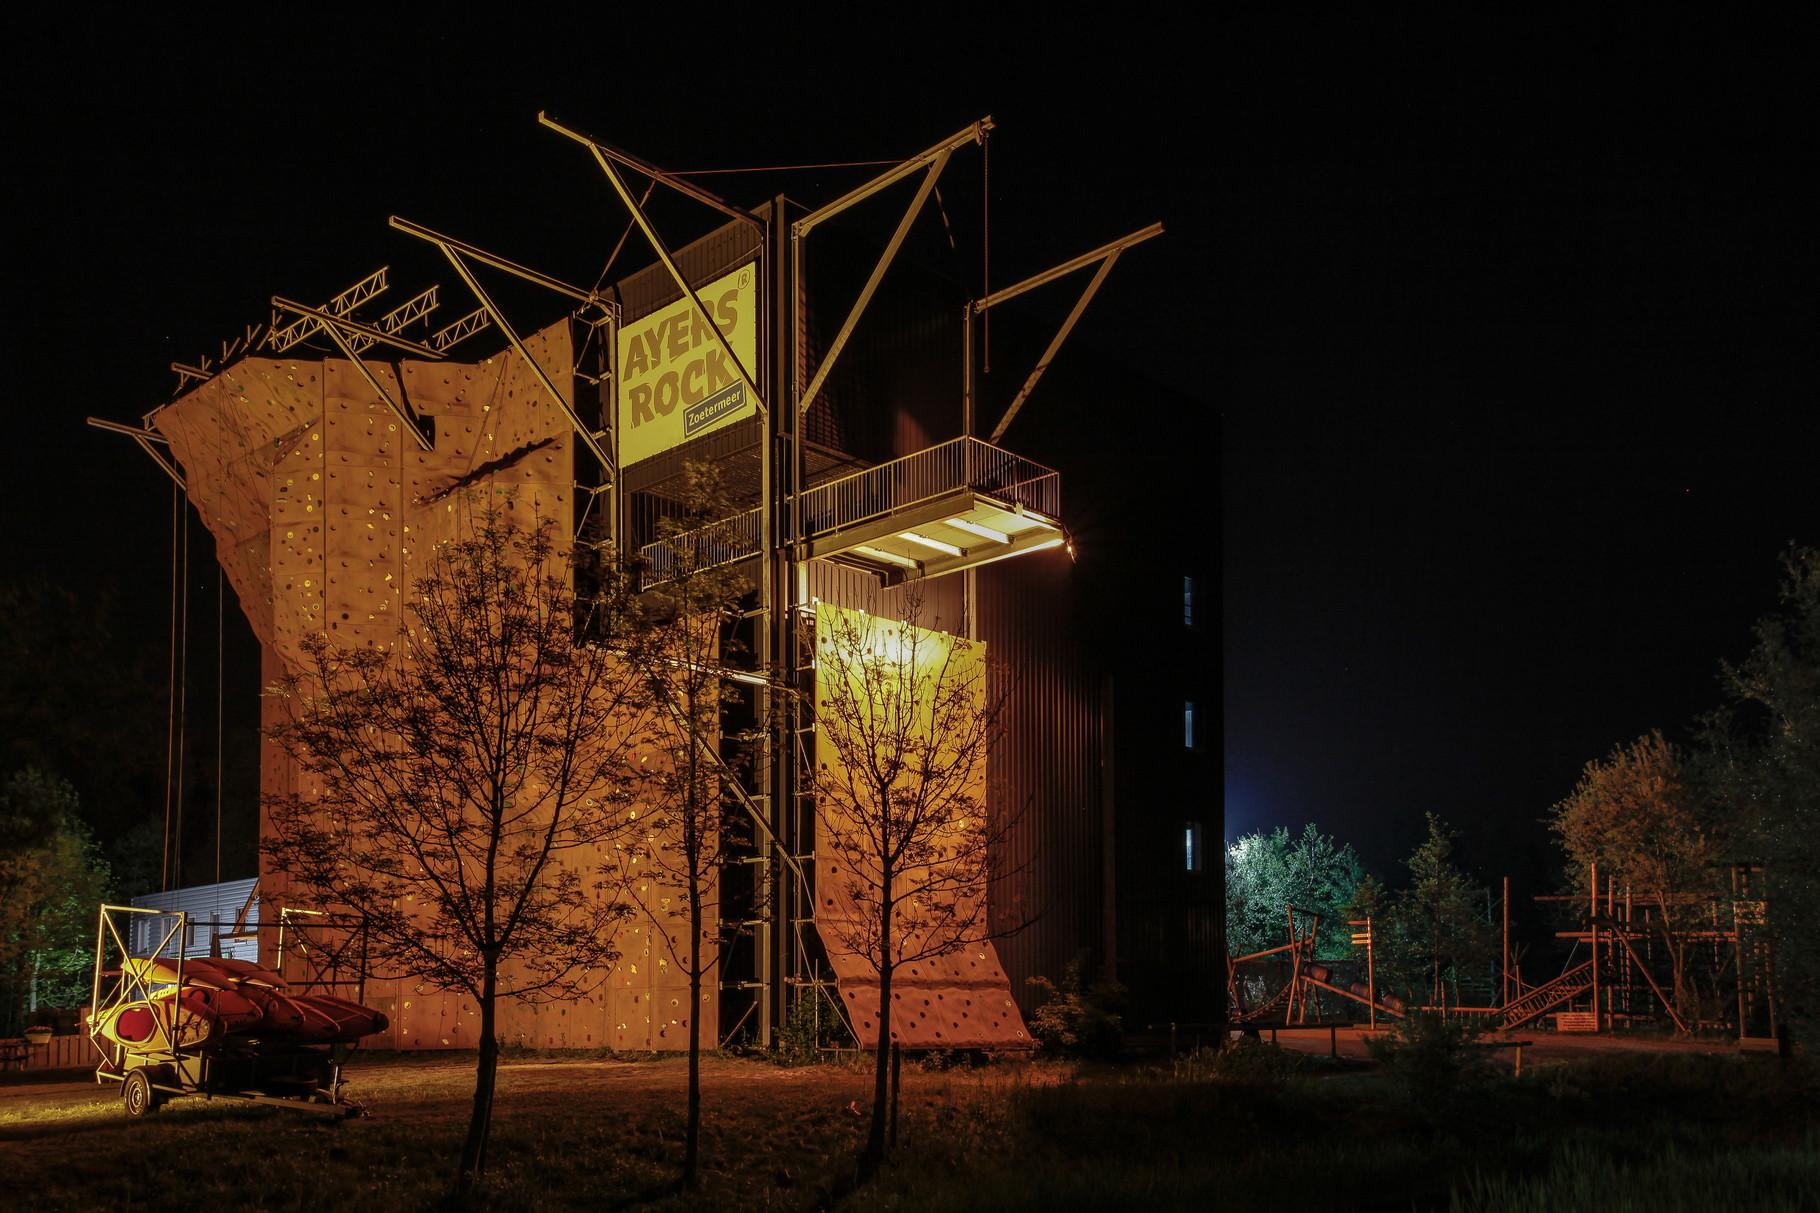 Nachtfoto Ayers Rock - DOKOE Fotografie